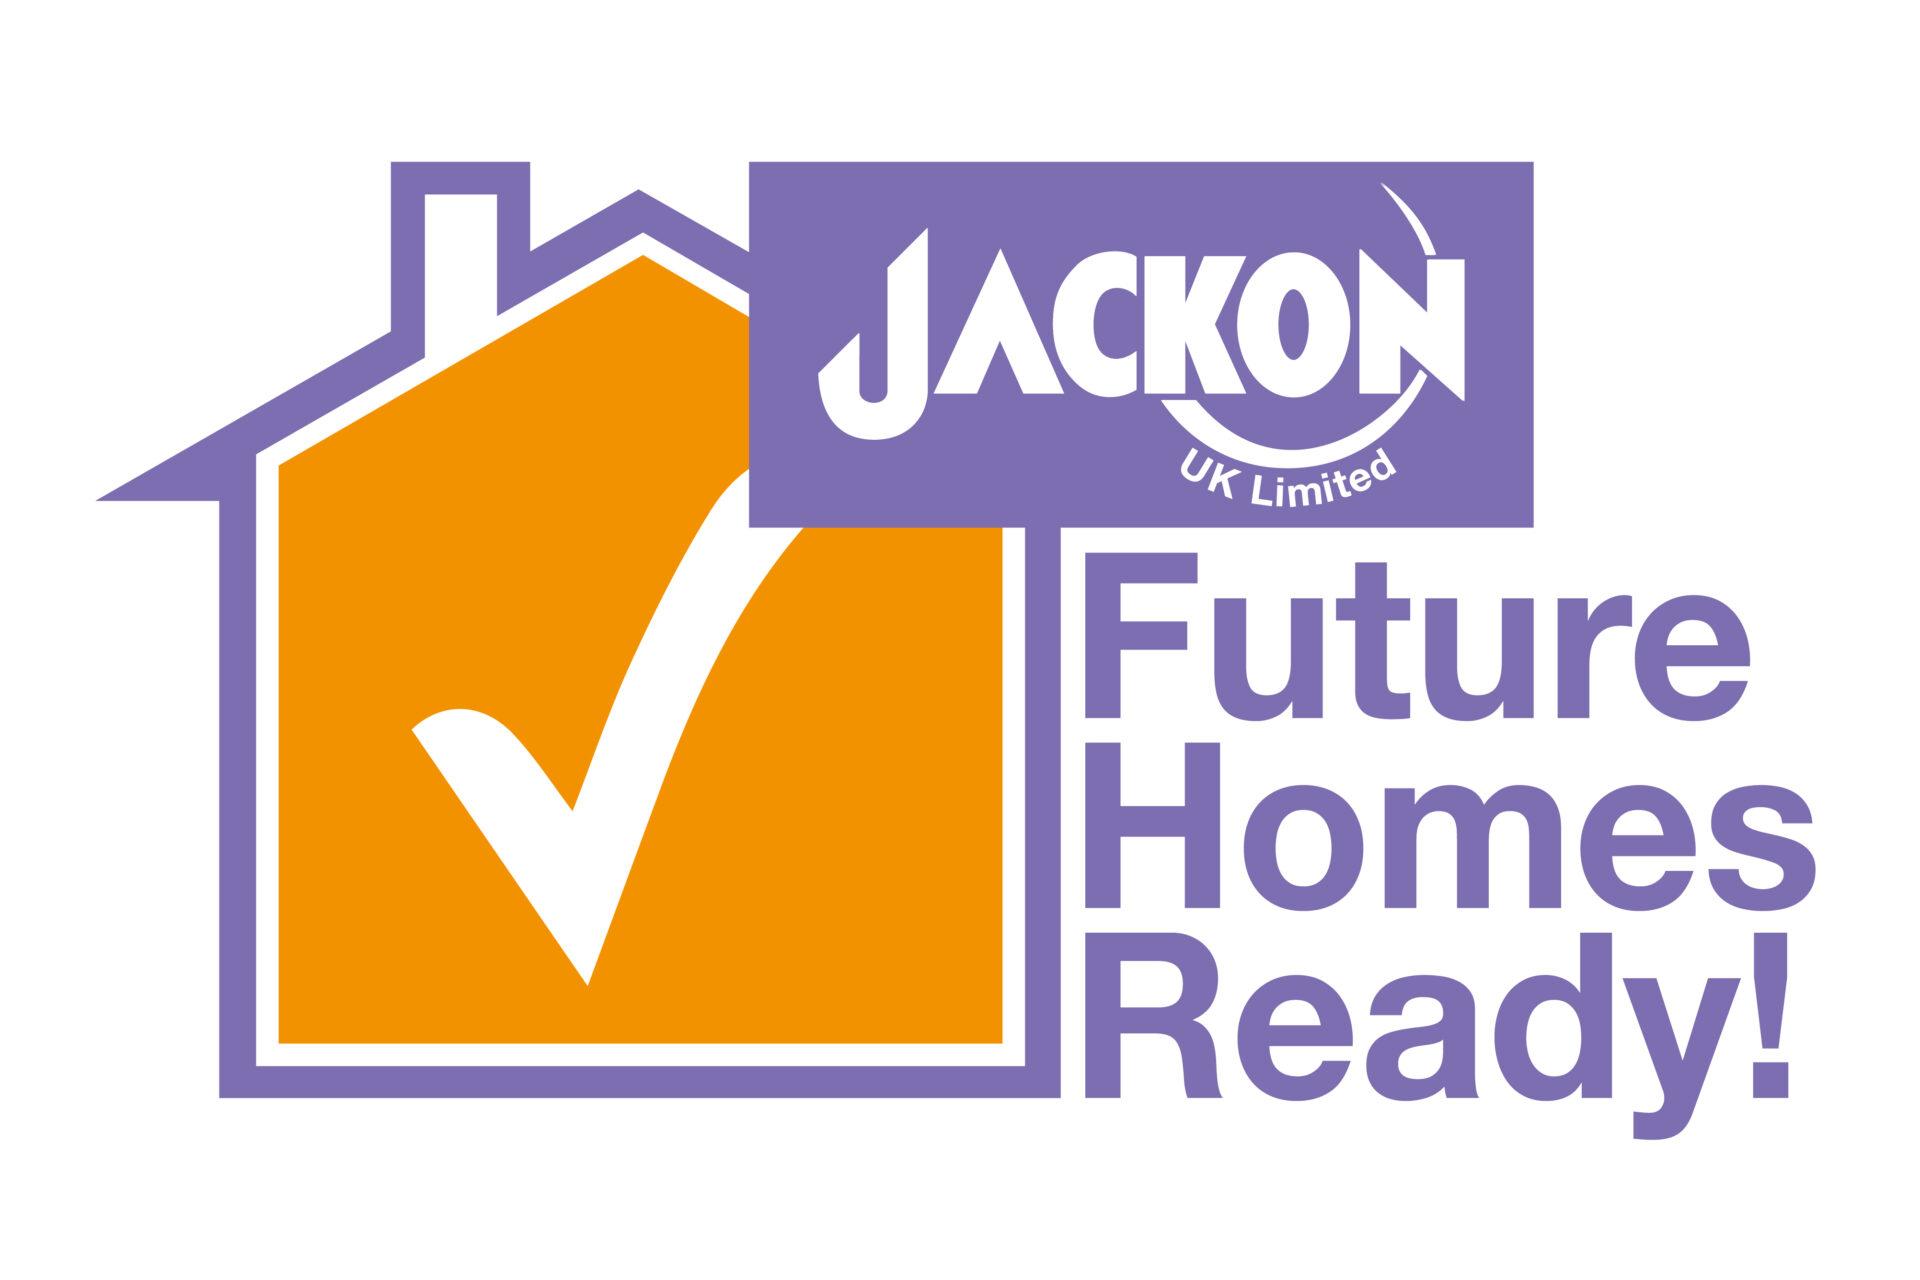 JACKON is 'Future Homes' ready!